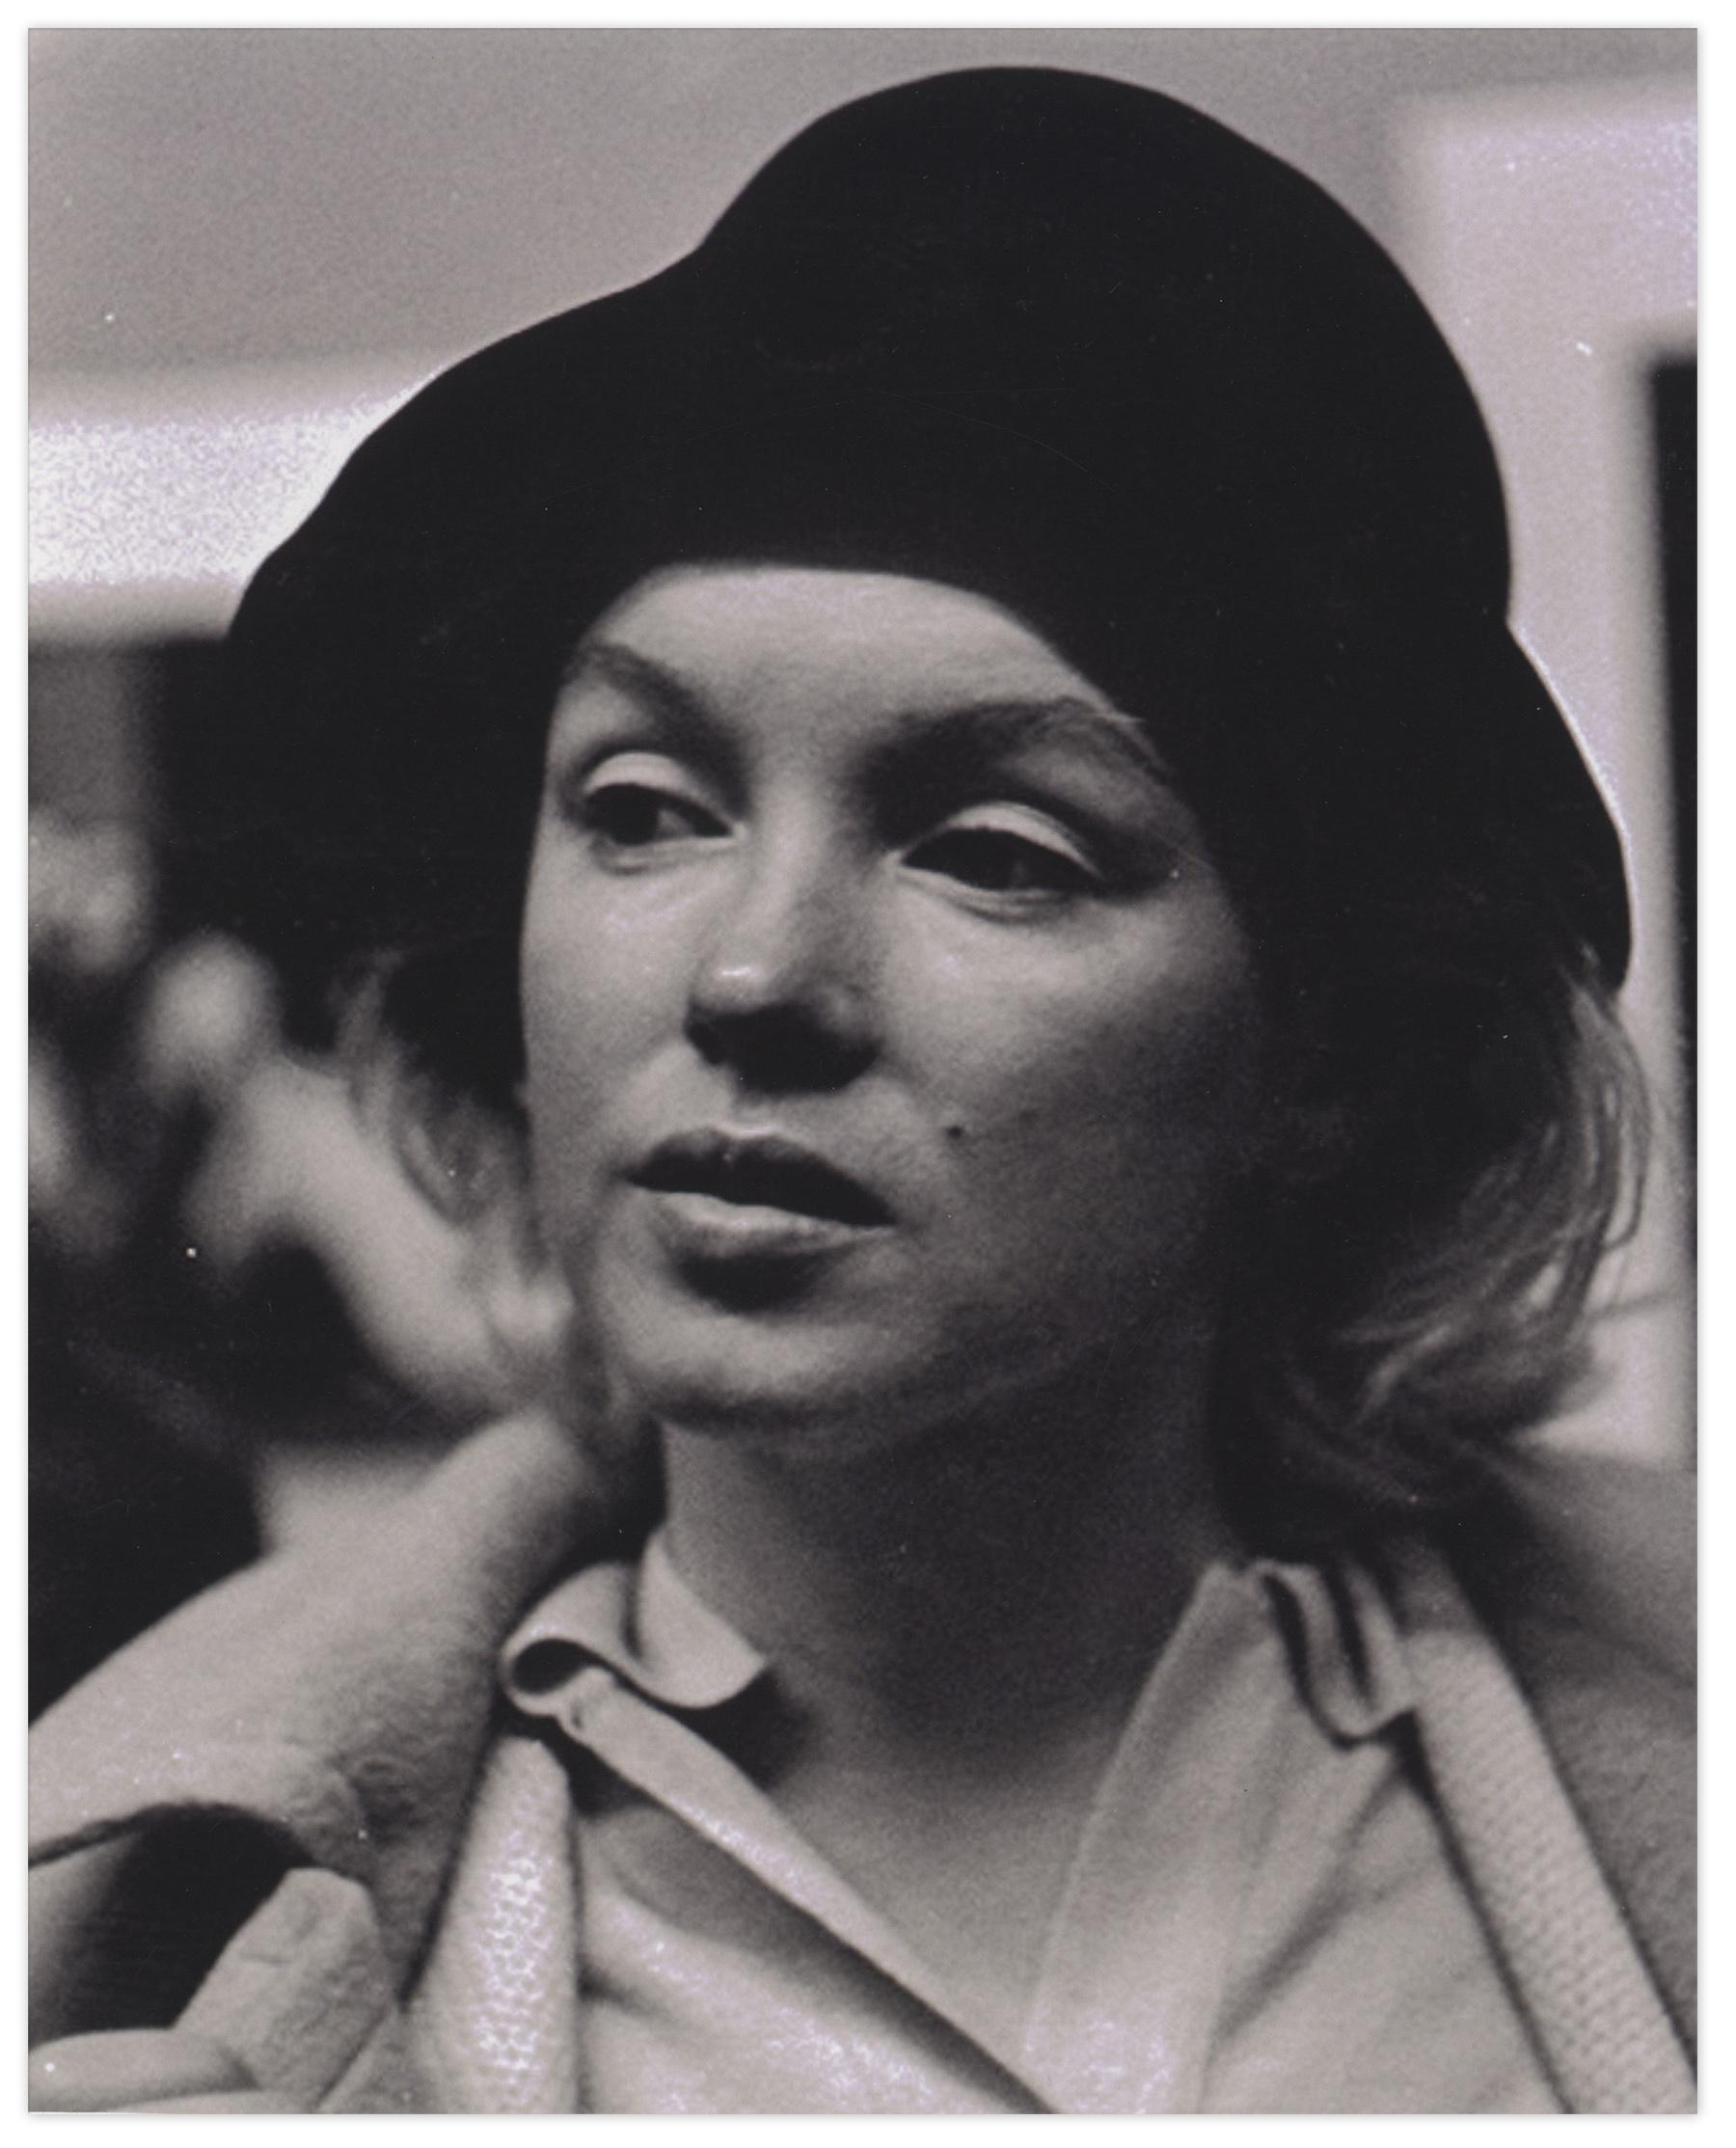 Marilyn Monroe hat goes on sale for £22,000 - AOL